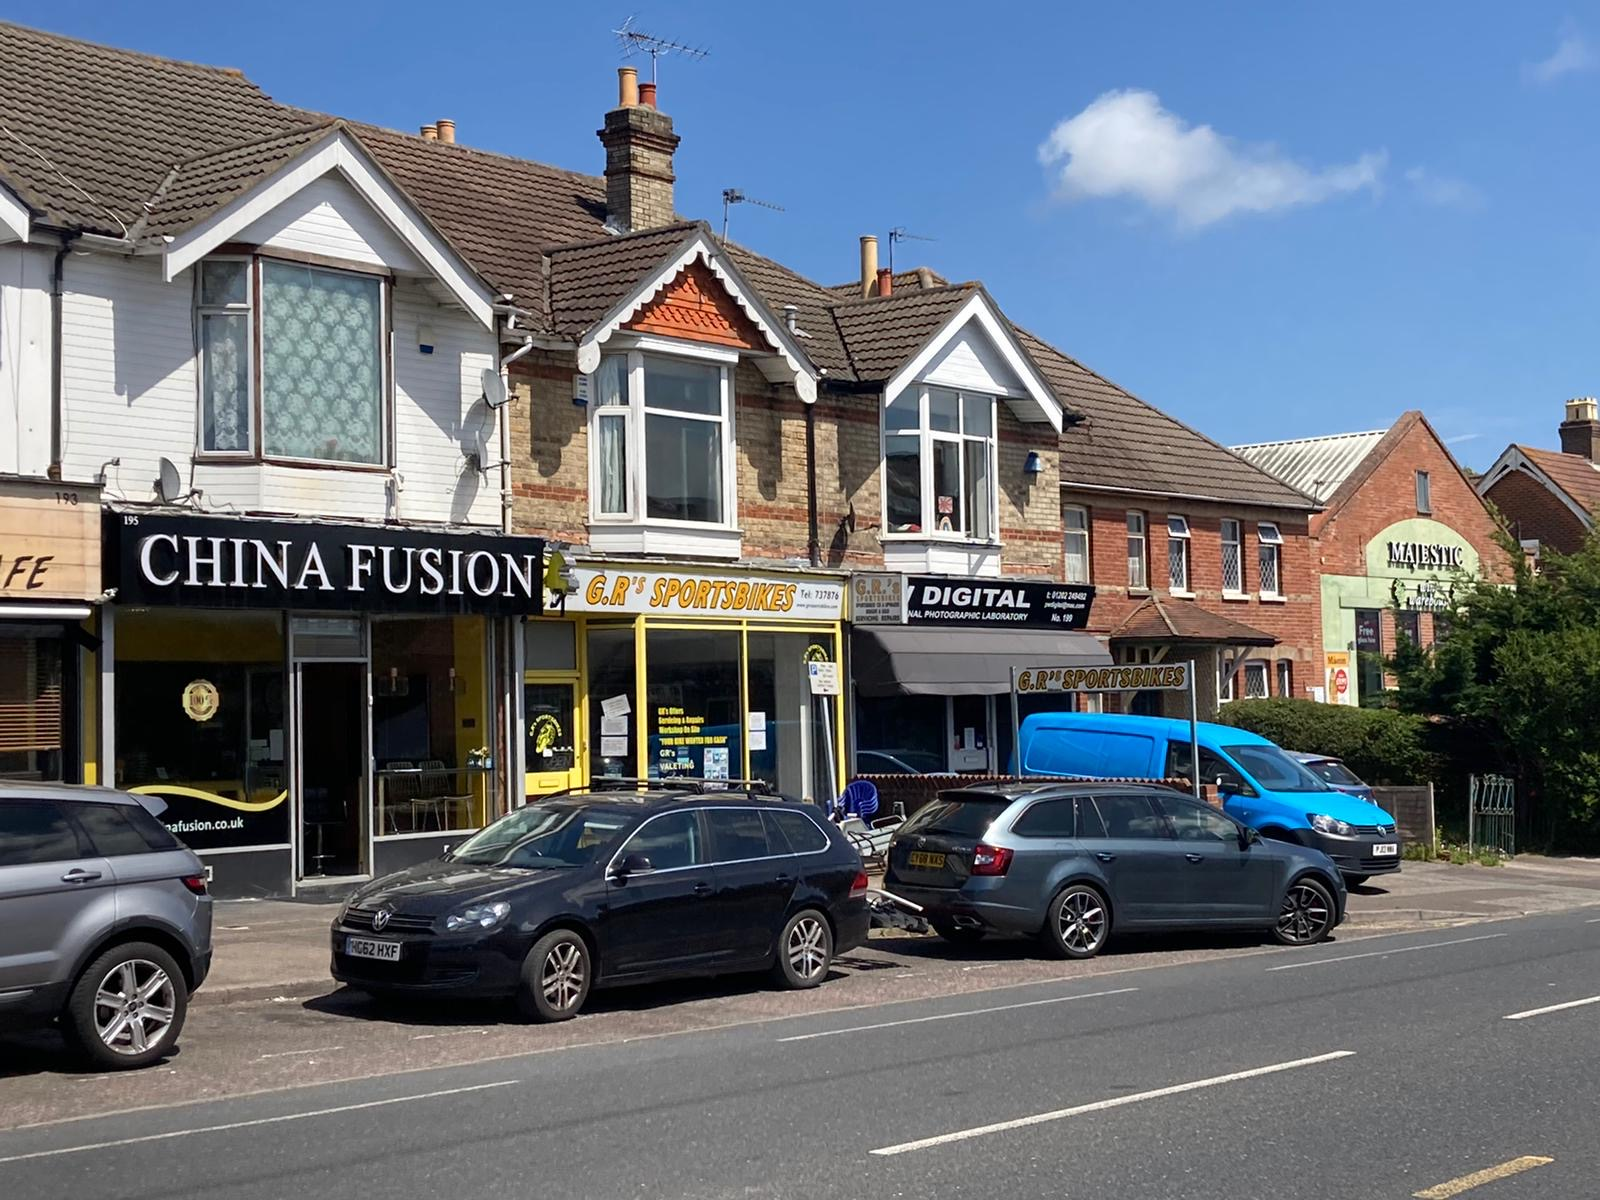 197 Bournemouth Road